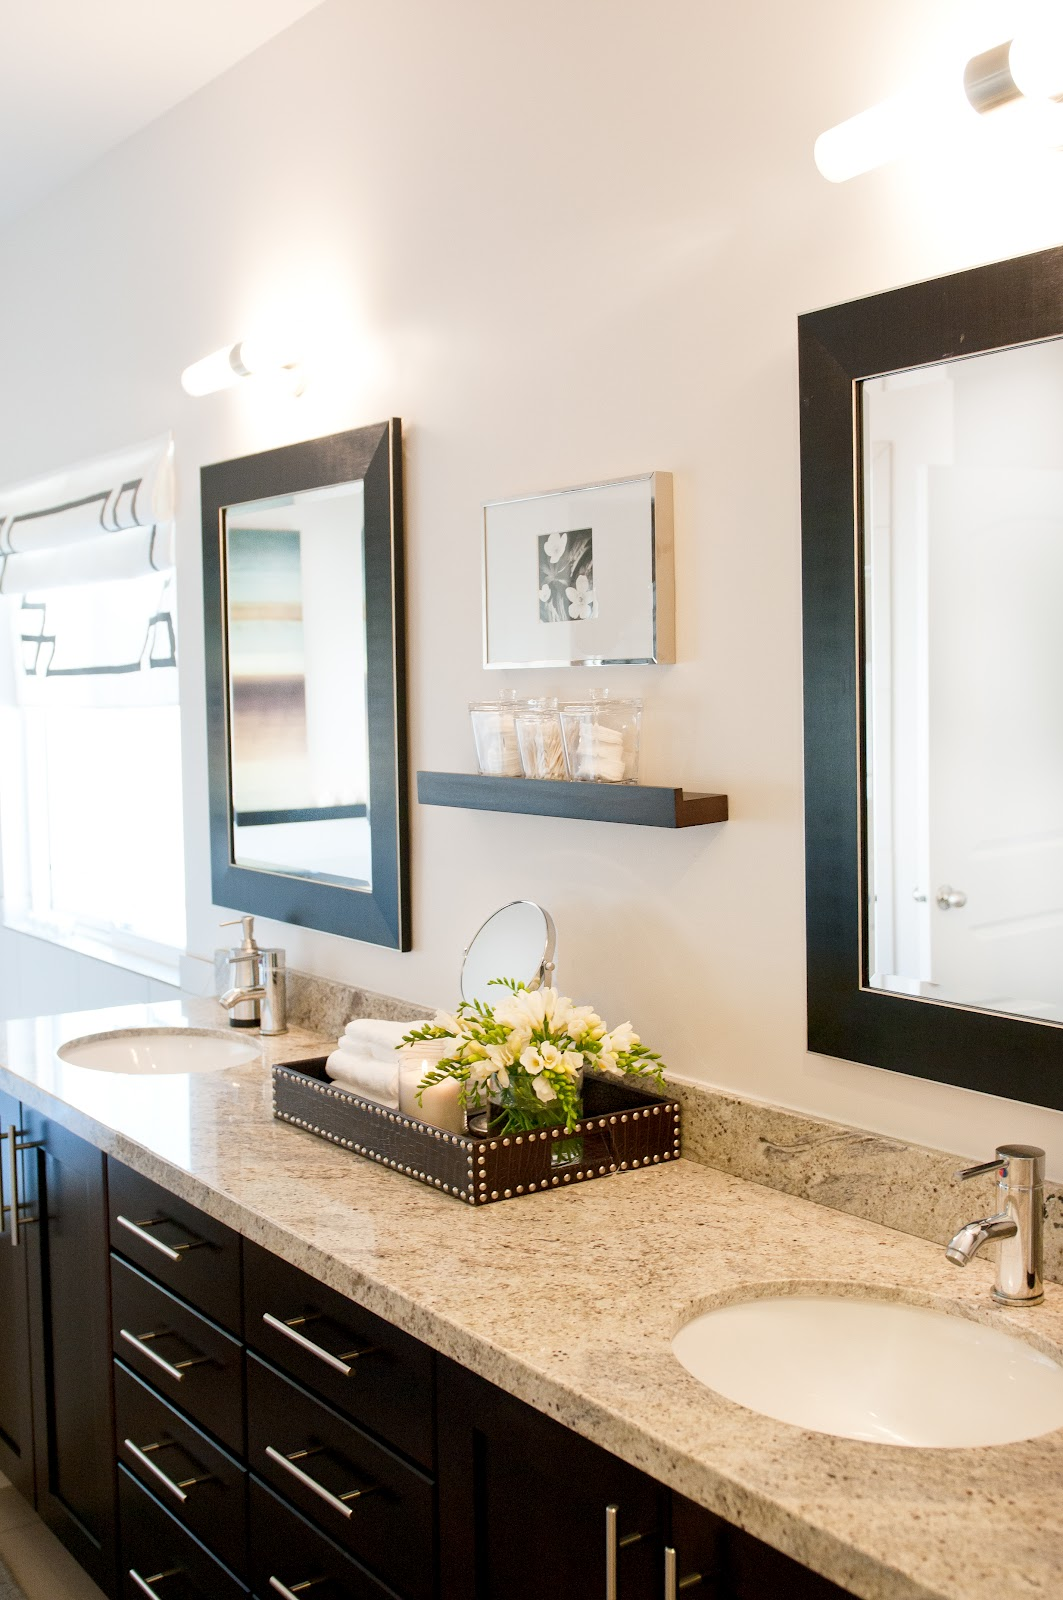 Ashley winn design before after master bedroom for Master bathroom mirror designs